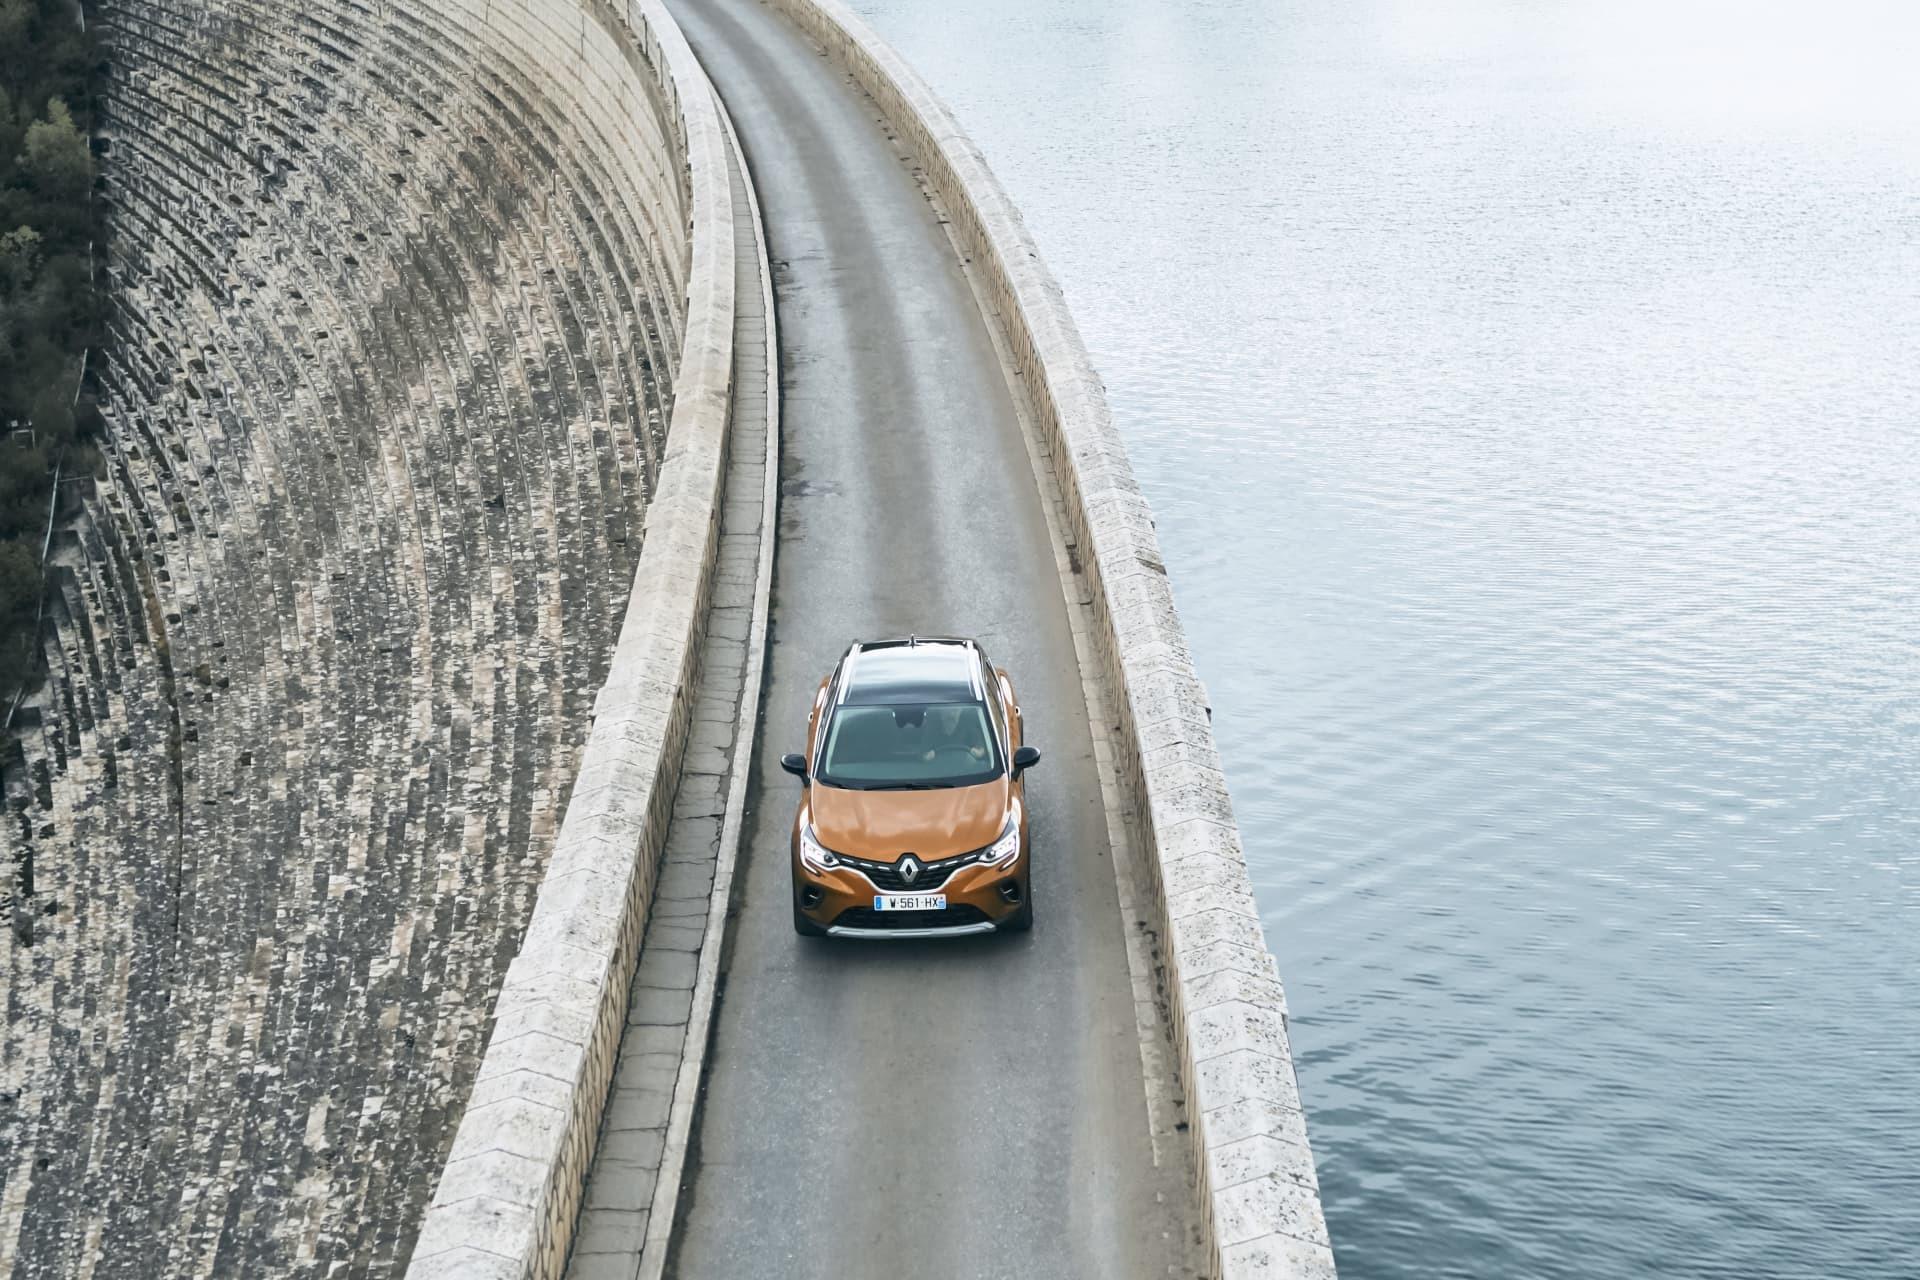 Diesel Gasolina Microhibrido 2021 Renault Captur